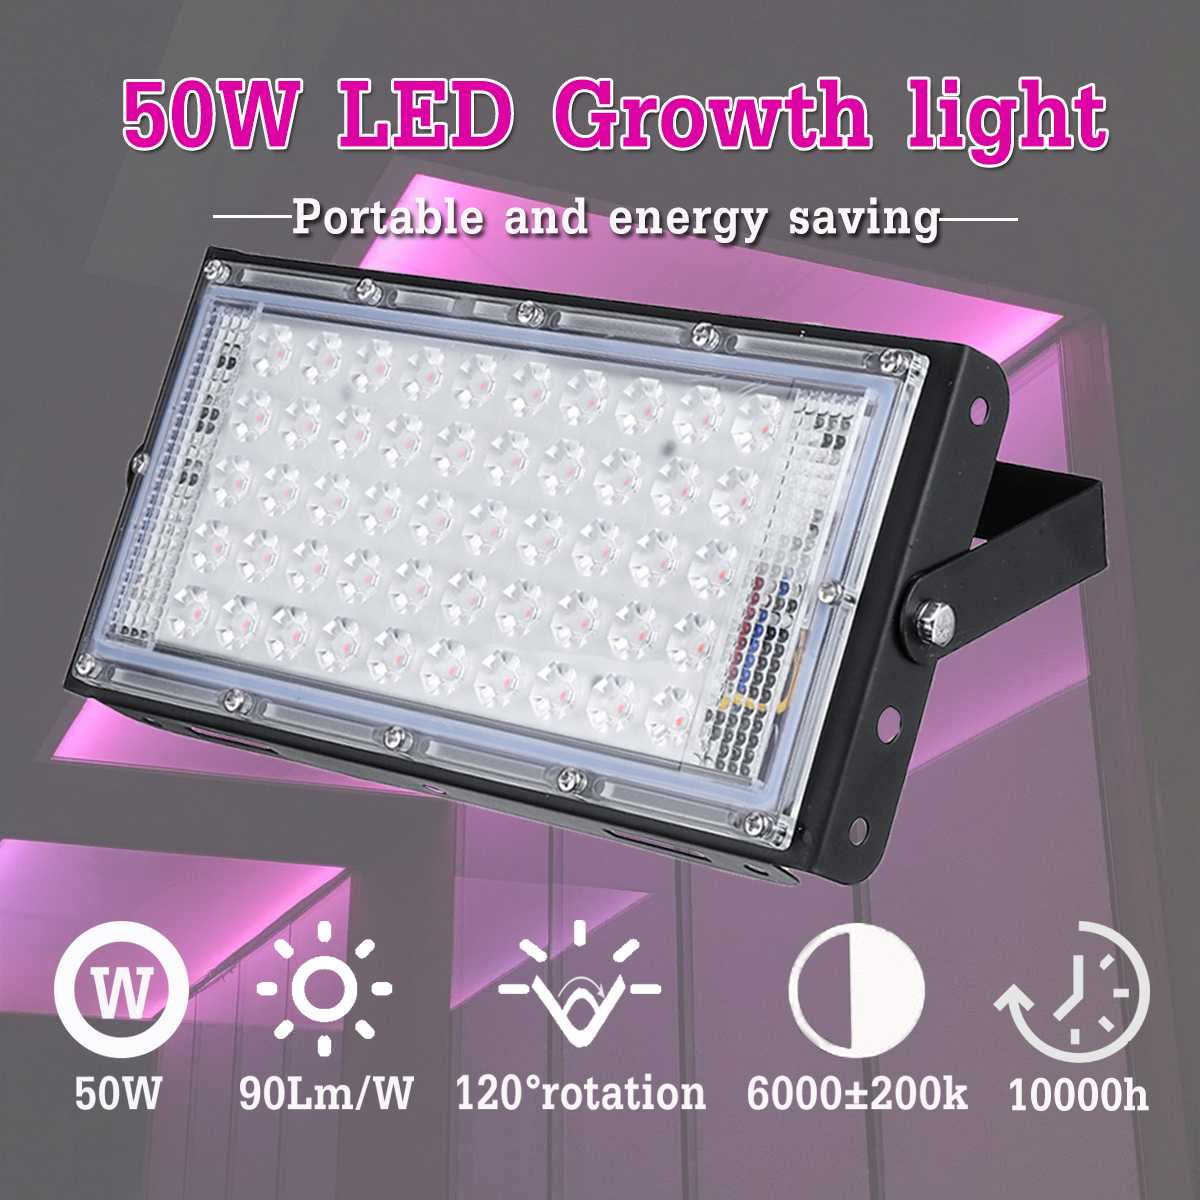 AC 220-240V LED Grow Light 50W Linear Spotlight Floodlight DIY Outdoor Lighting Indoor Hydroponic Flowers Farm Plants Grow Lamp